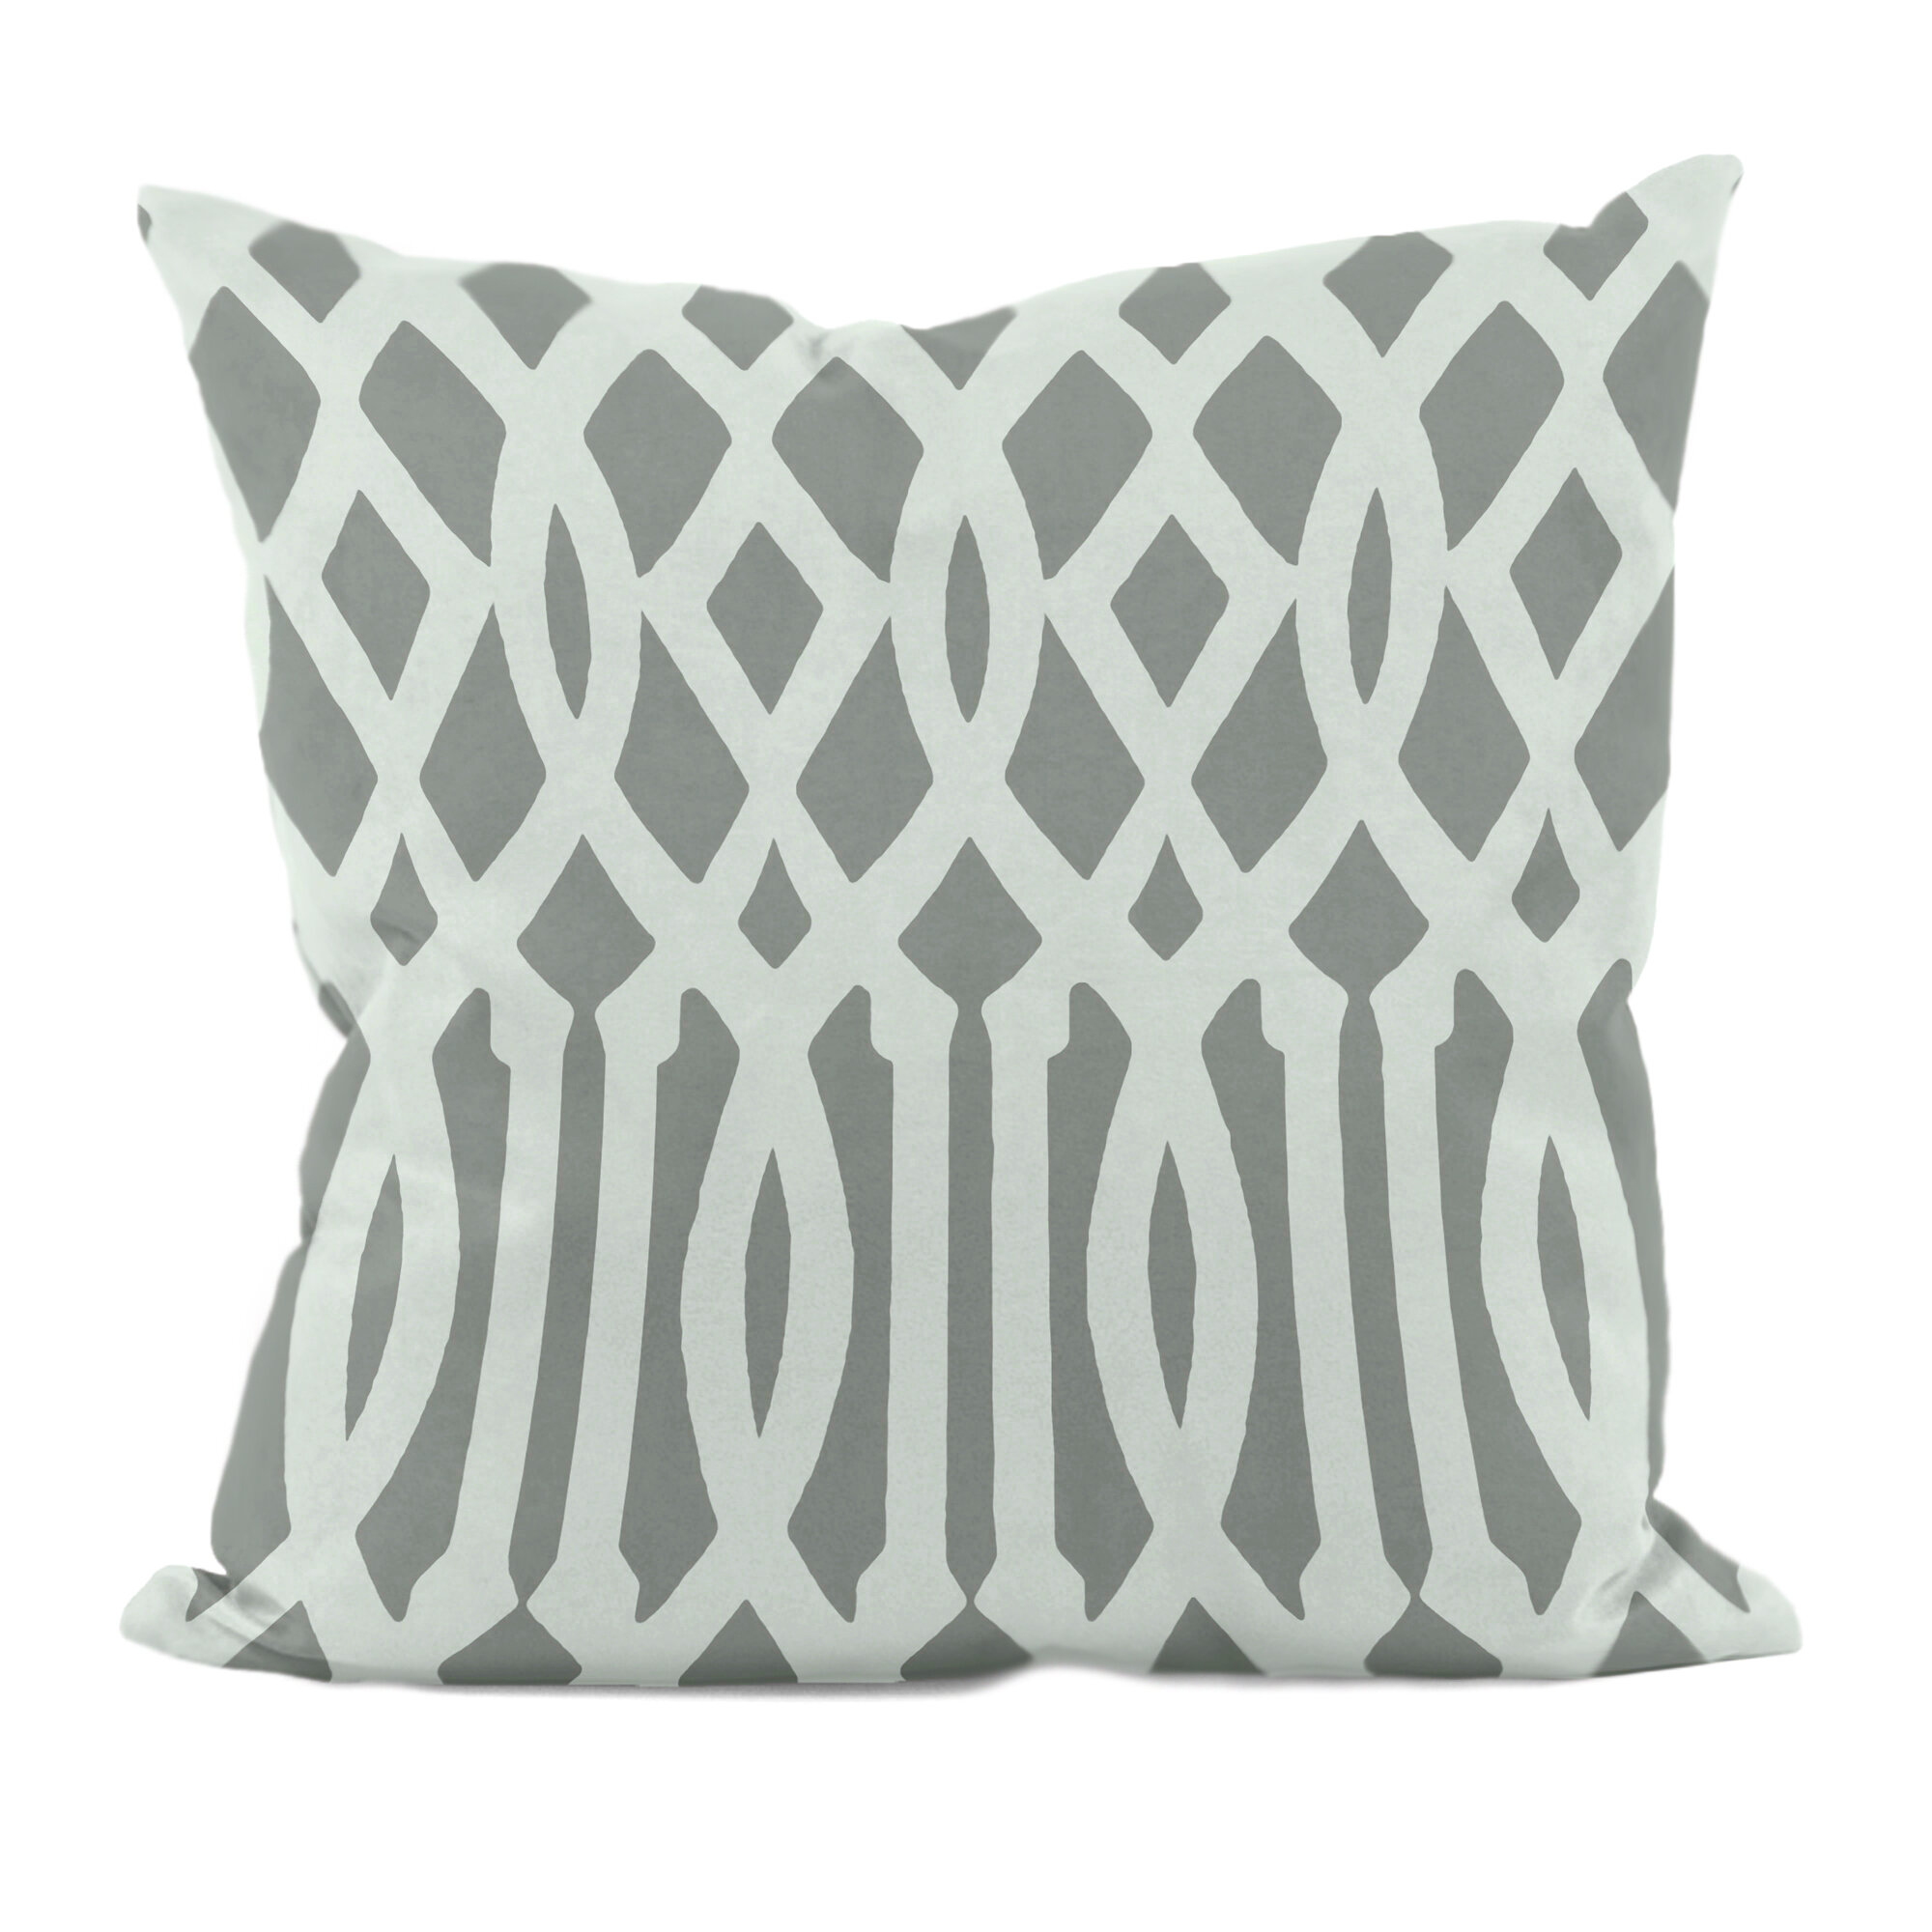 E by design Decorative Pillow Black